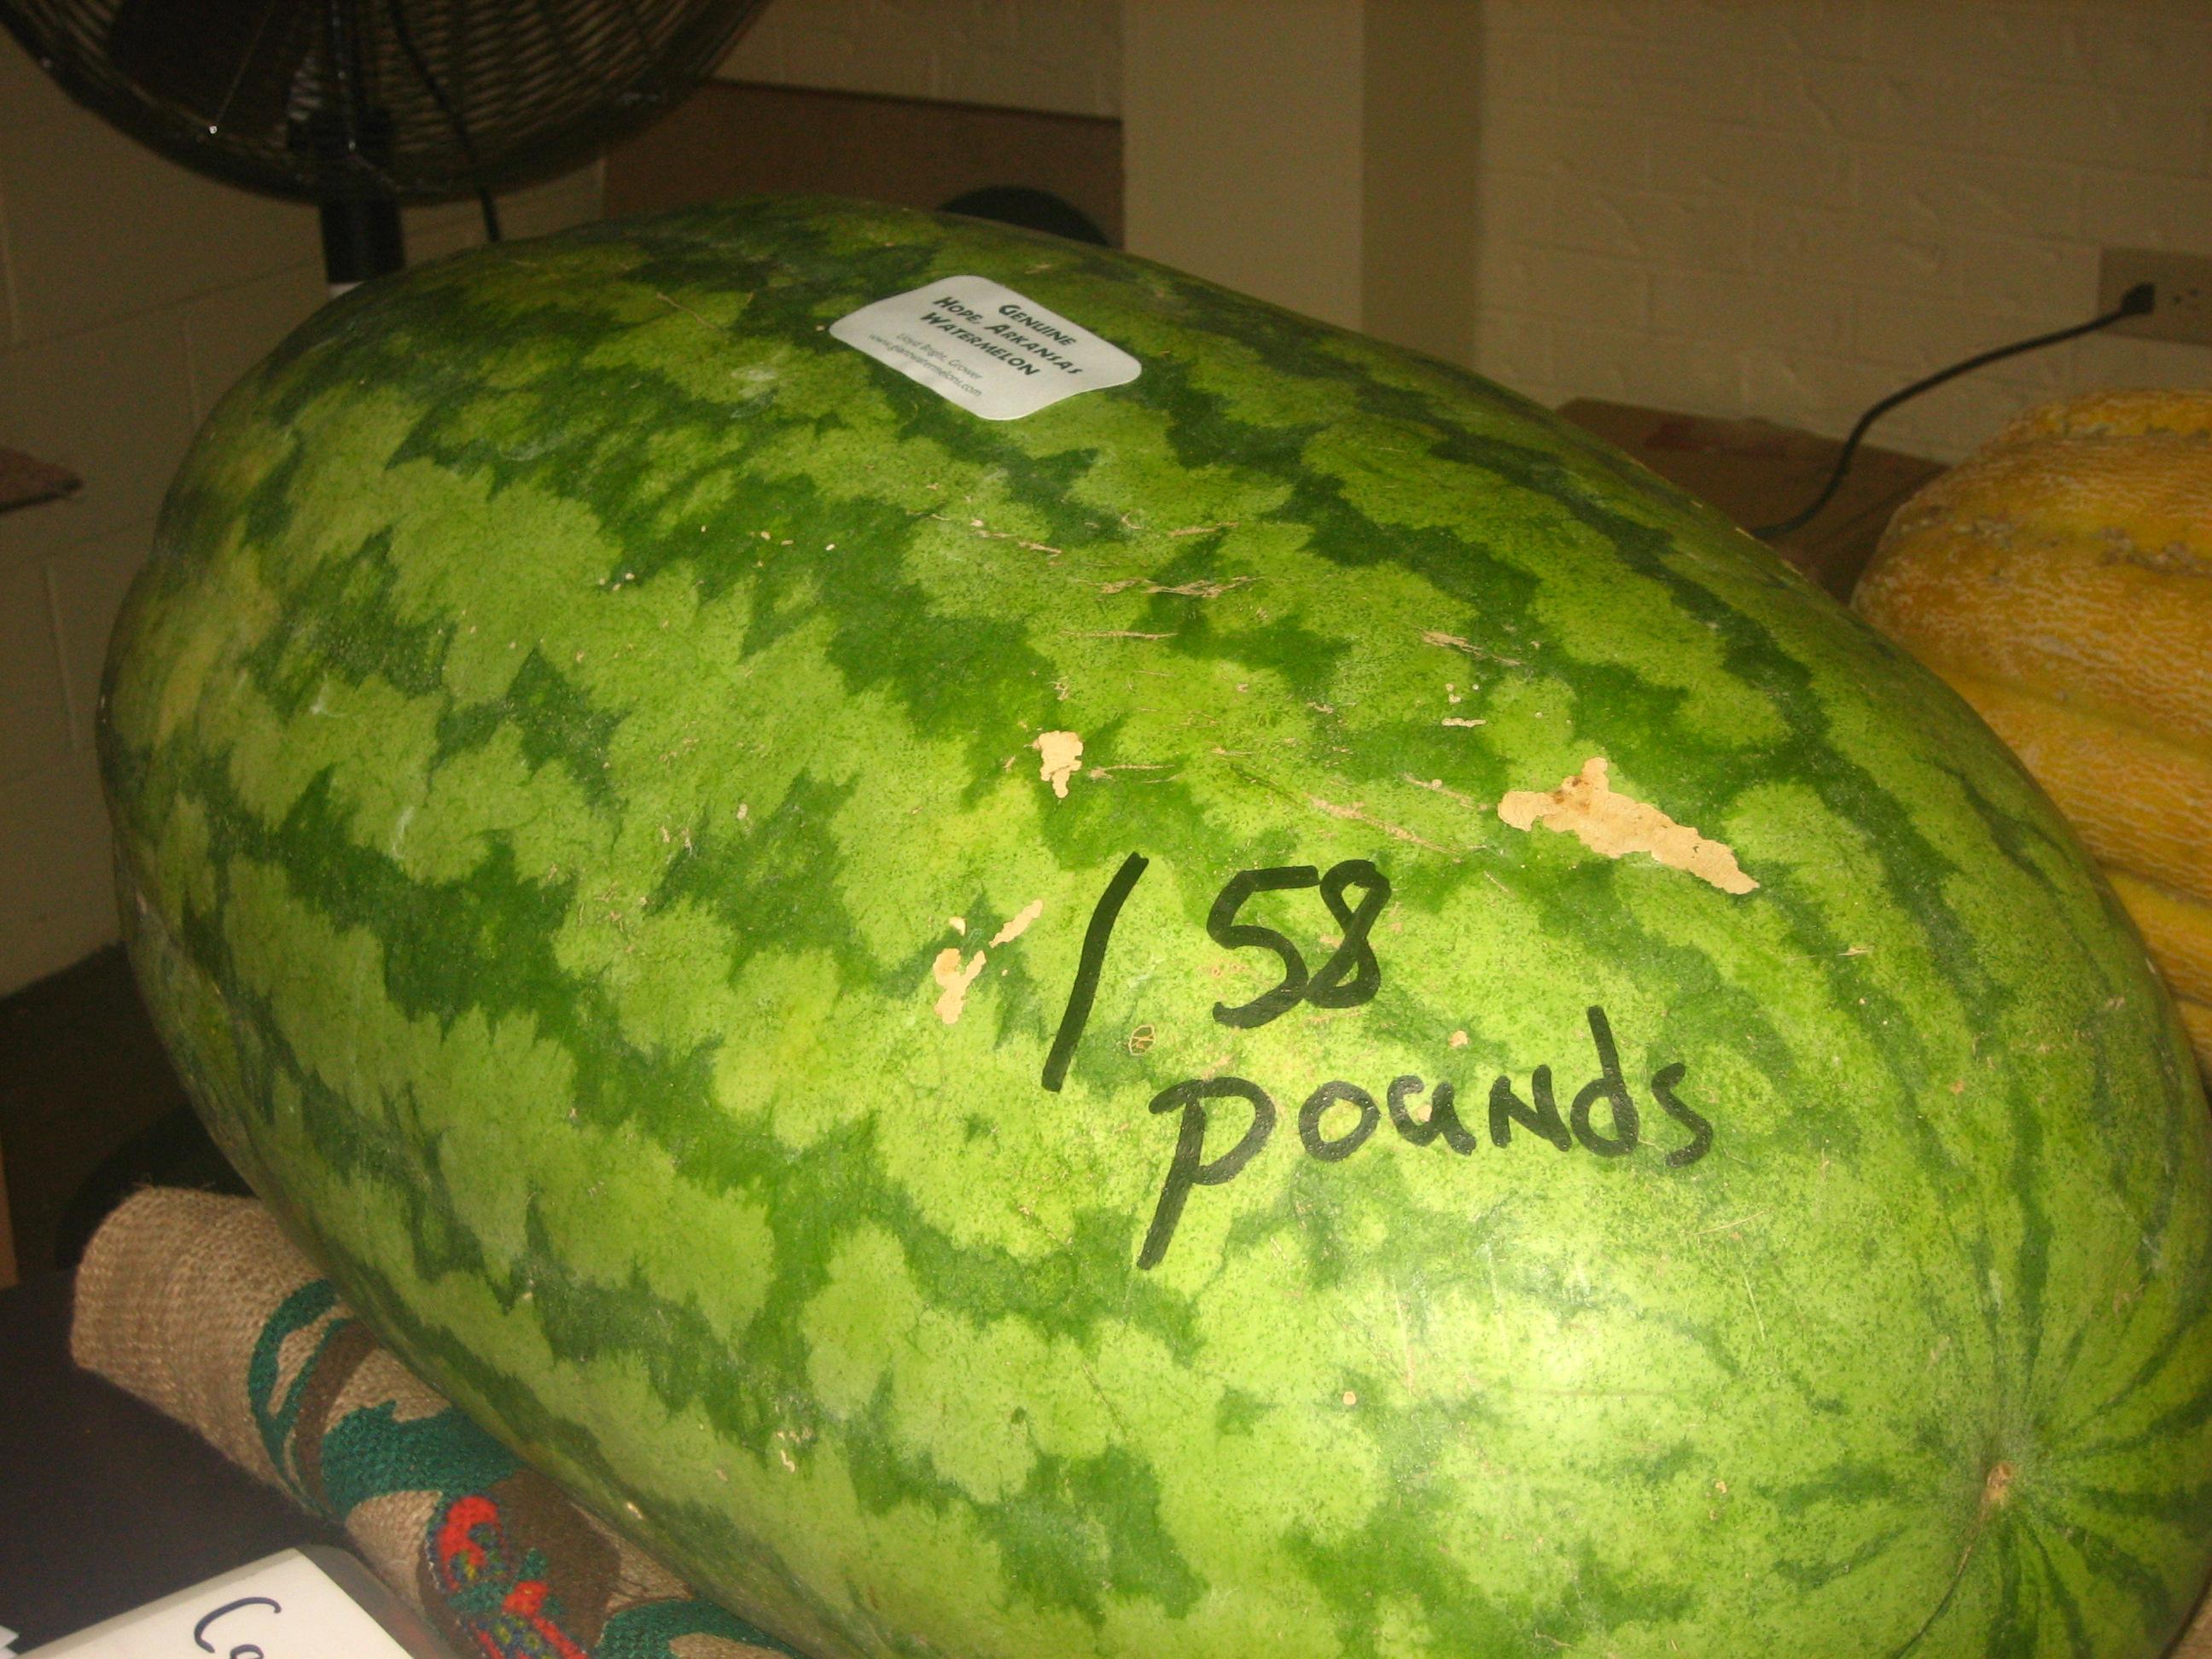 File:Hope, AR watermelon IMG 1516.JPG - Wikimedia Commons